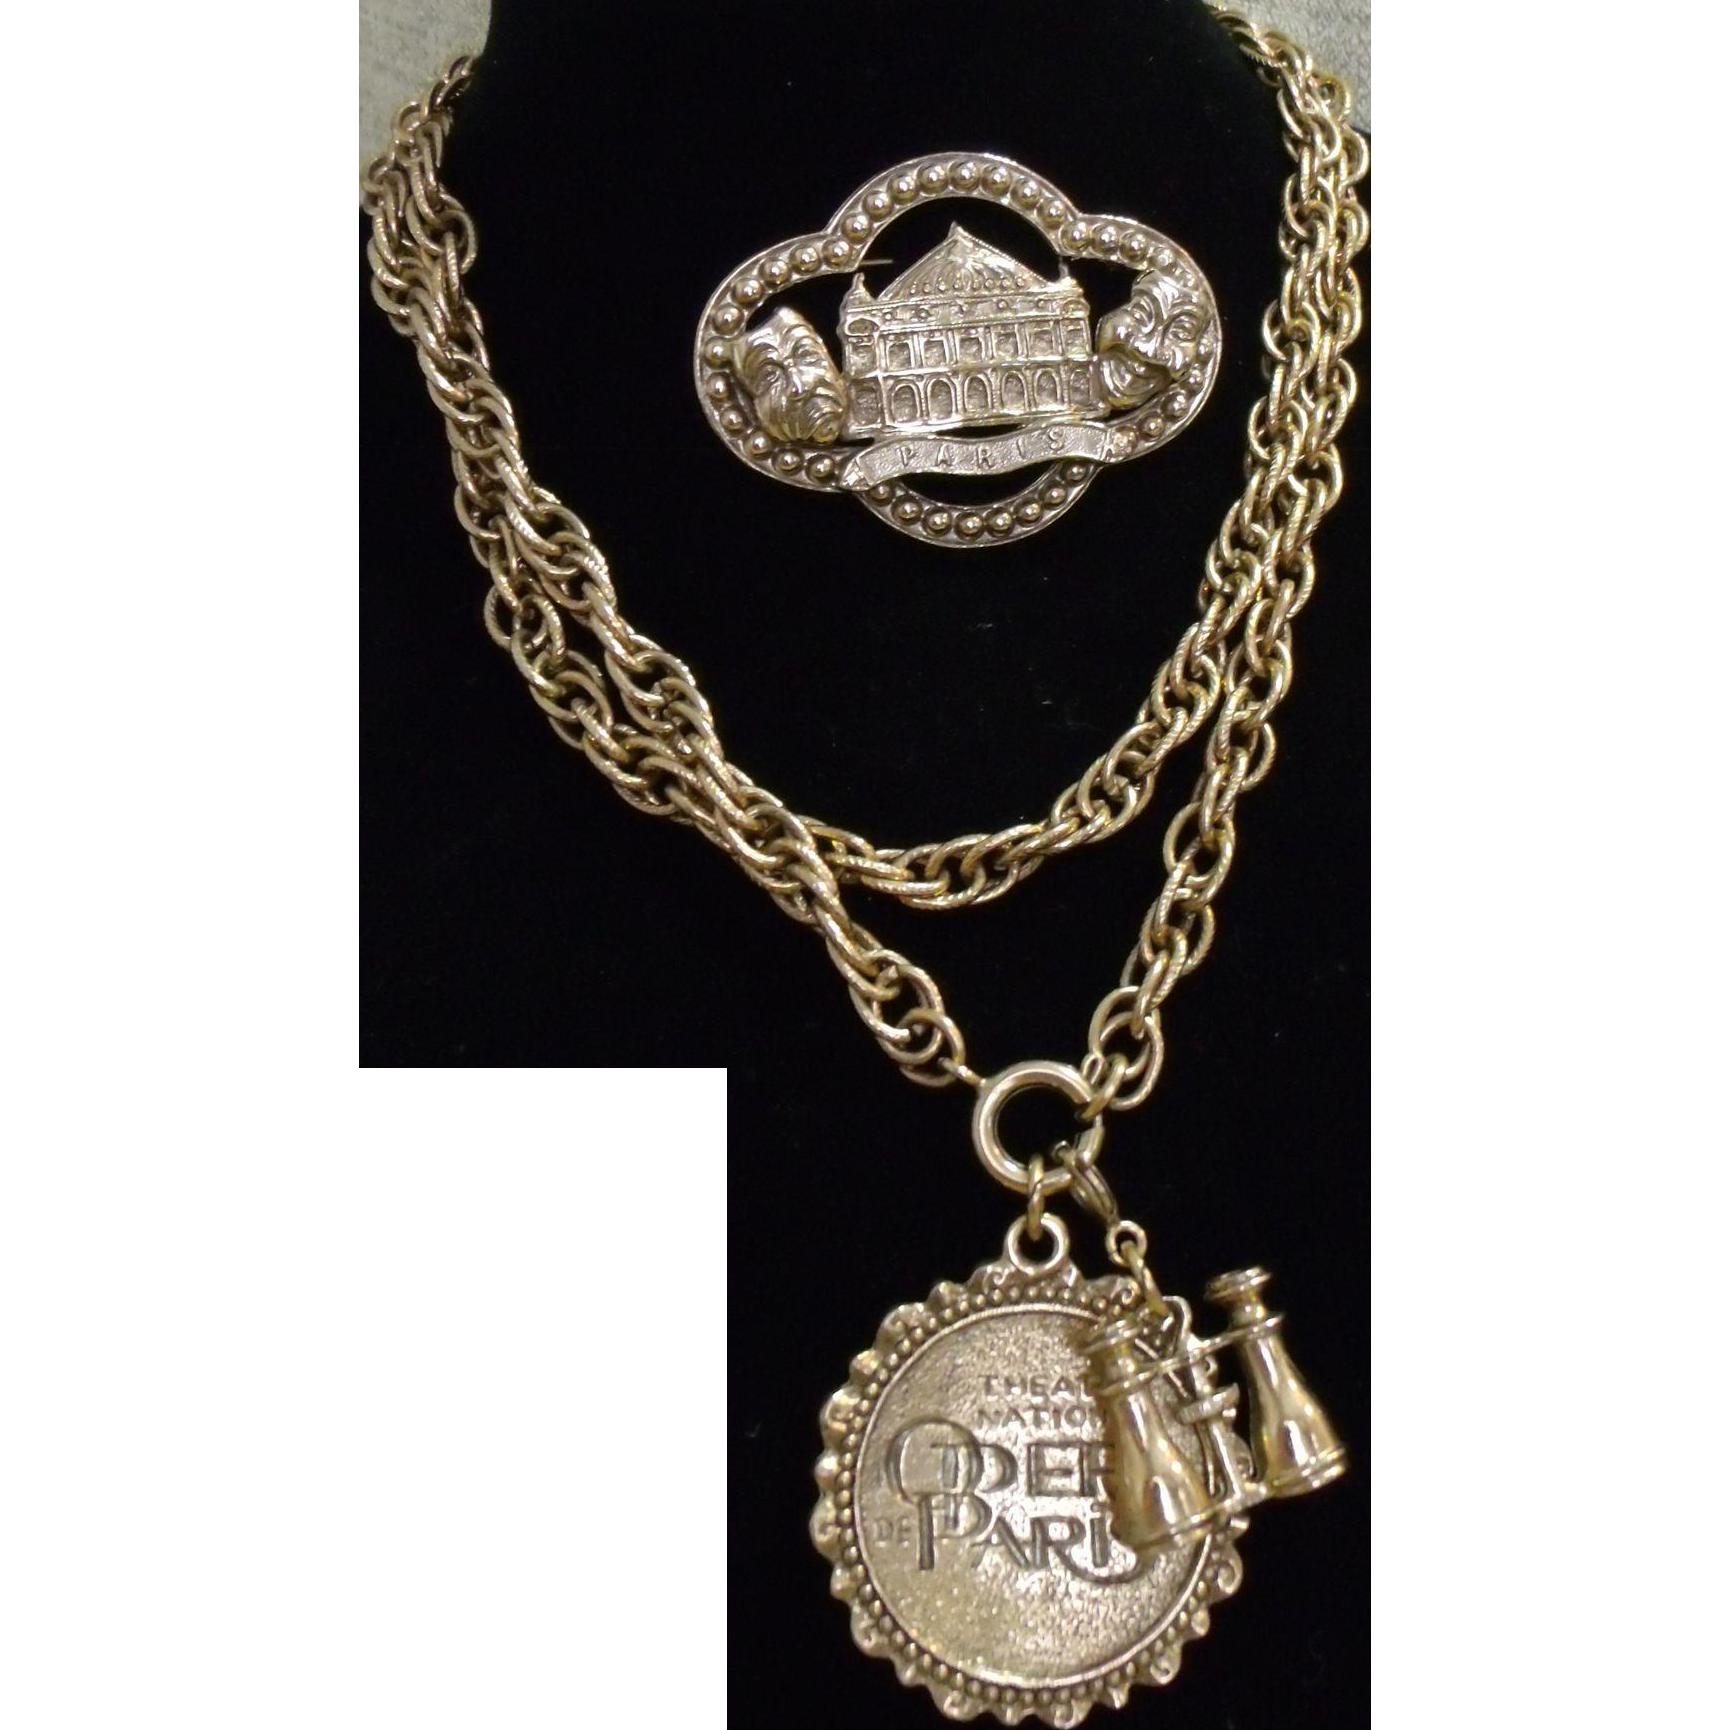 Souvenir Theatre National Opera De Paris Necklace & Pin Gold Tone